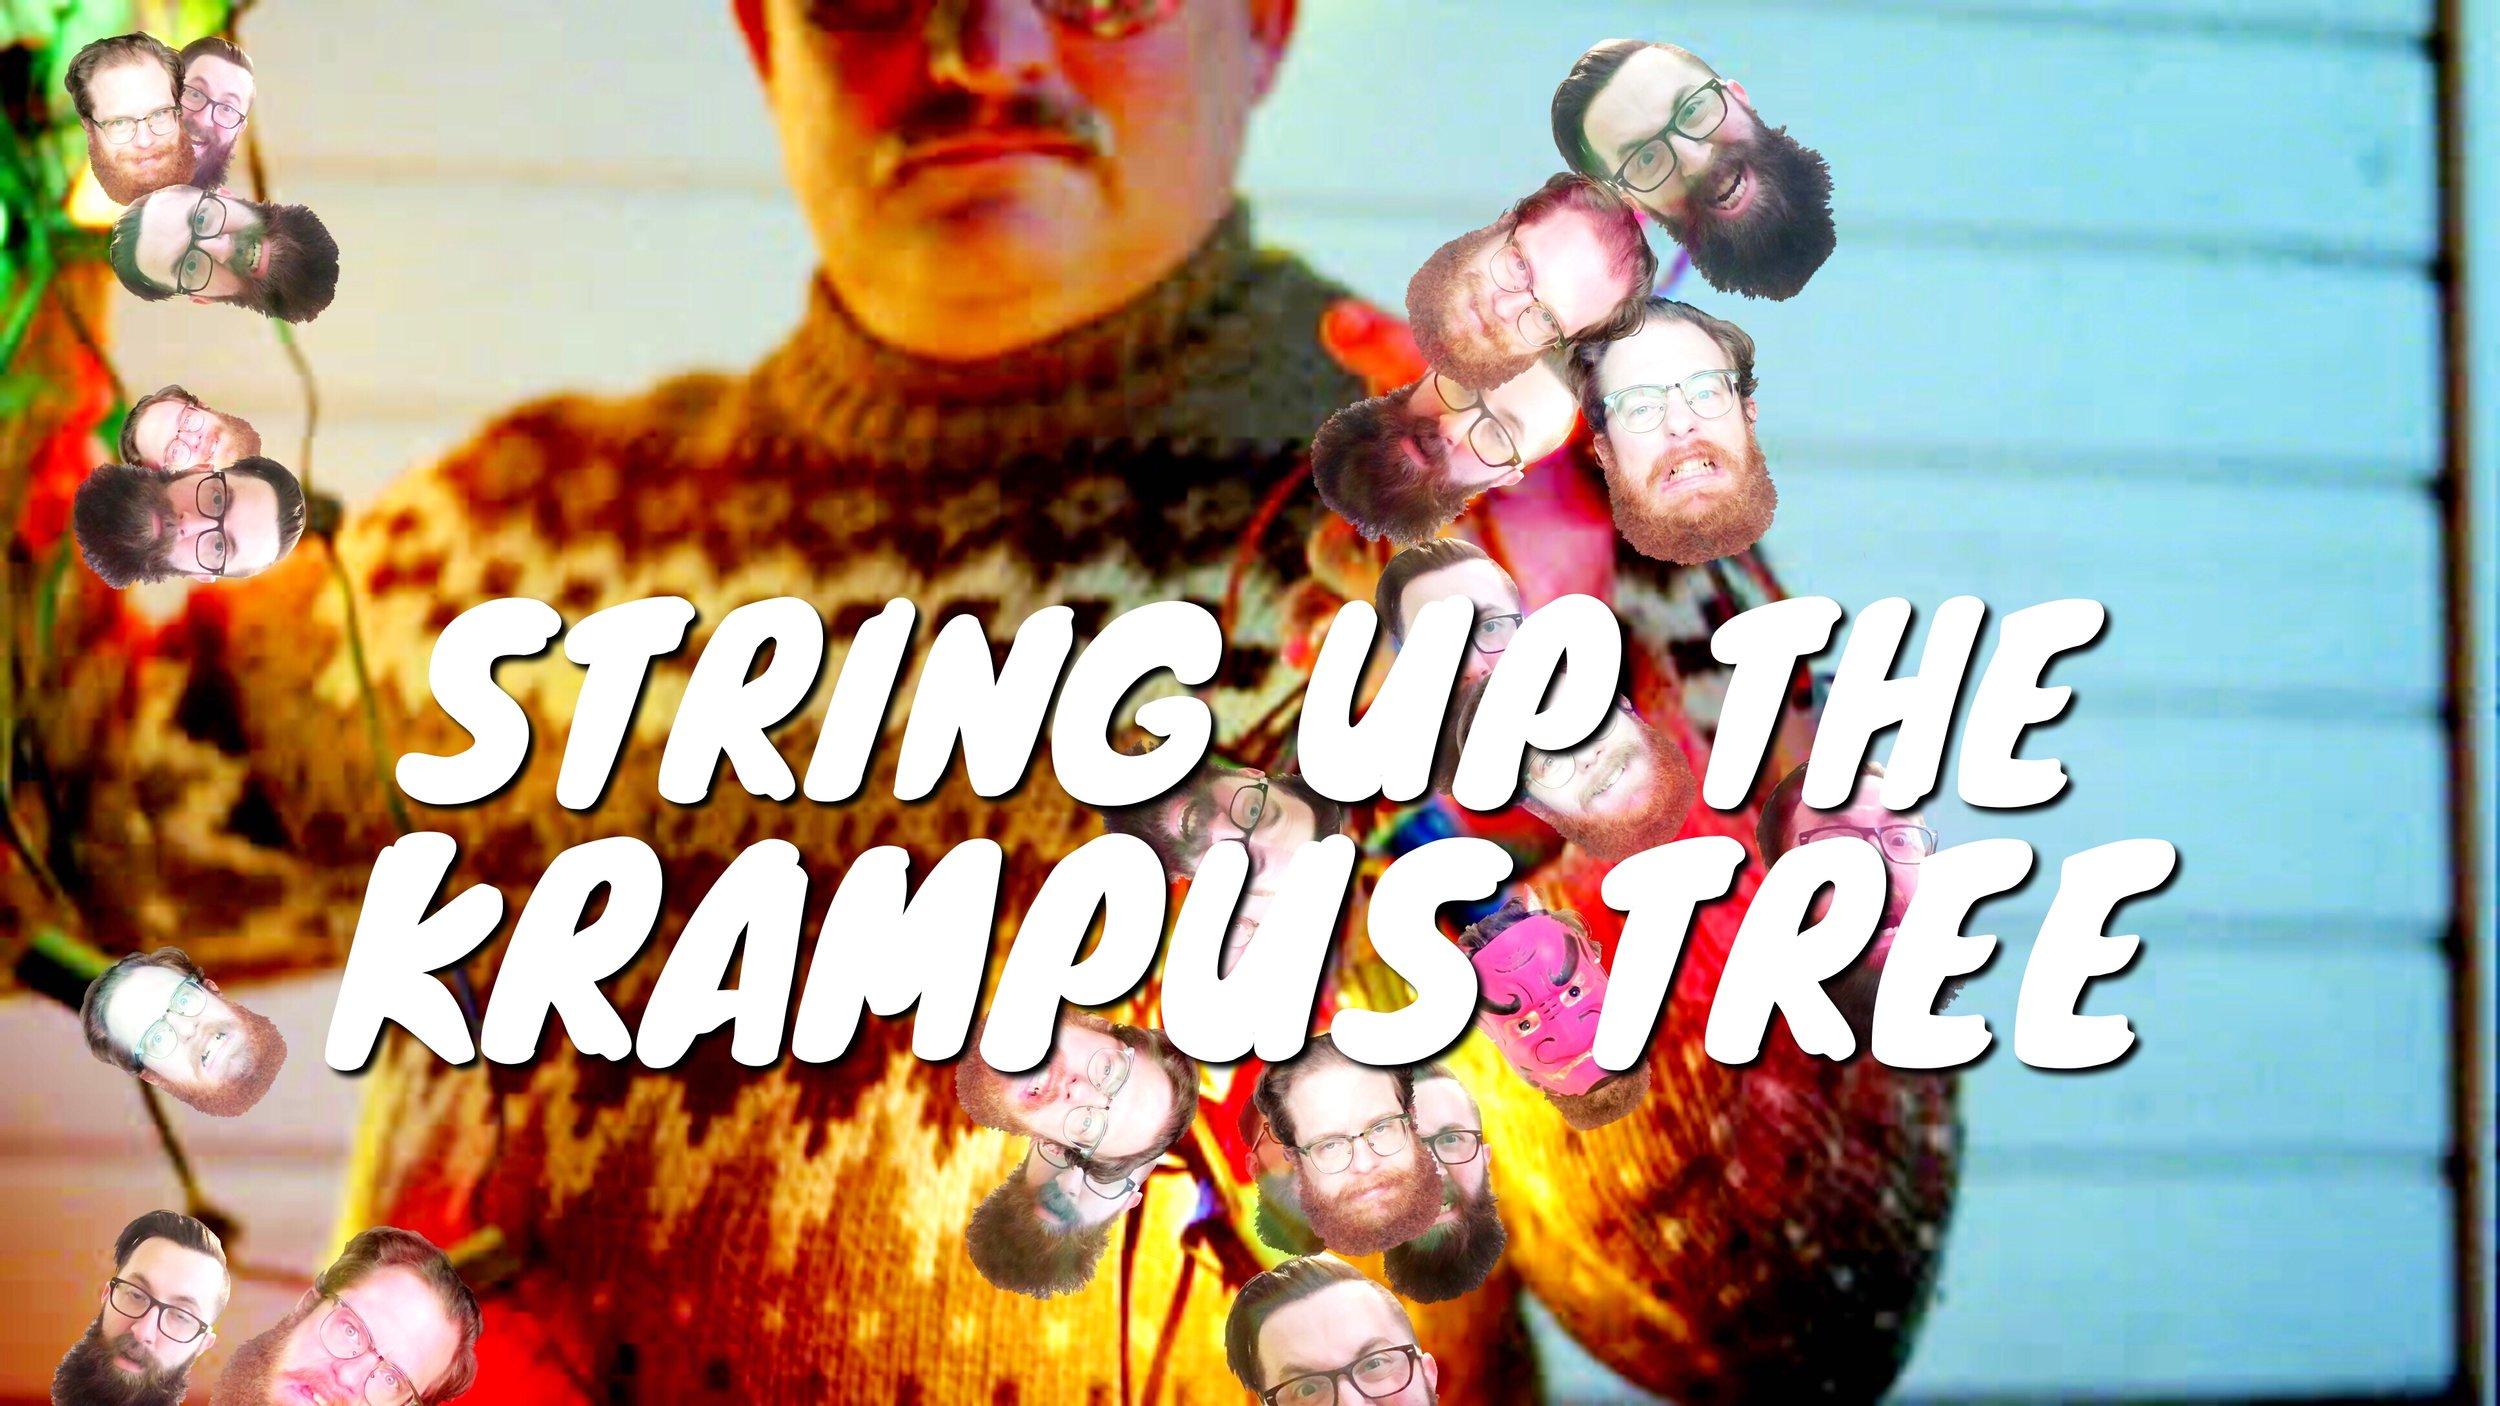 String Up the Krampus Tree.jpg